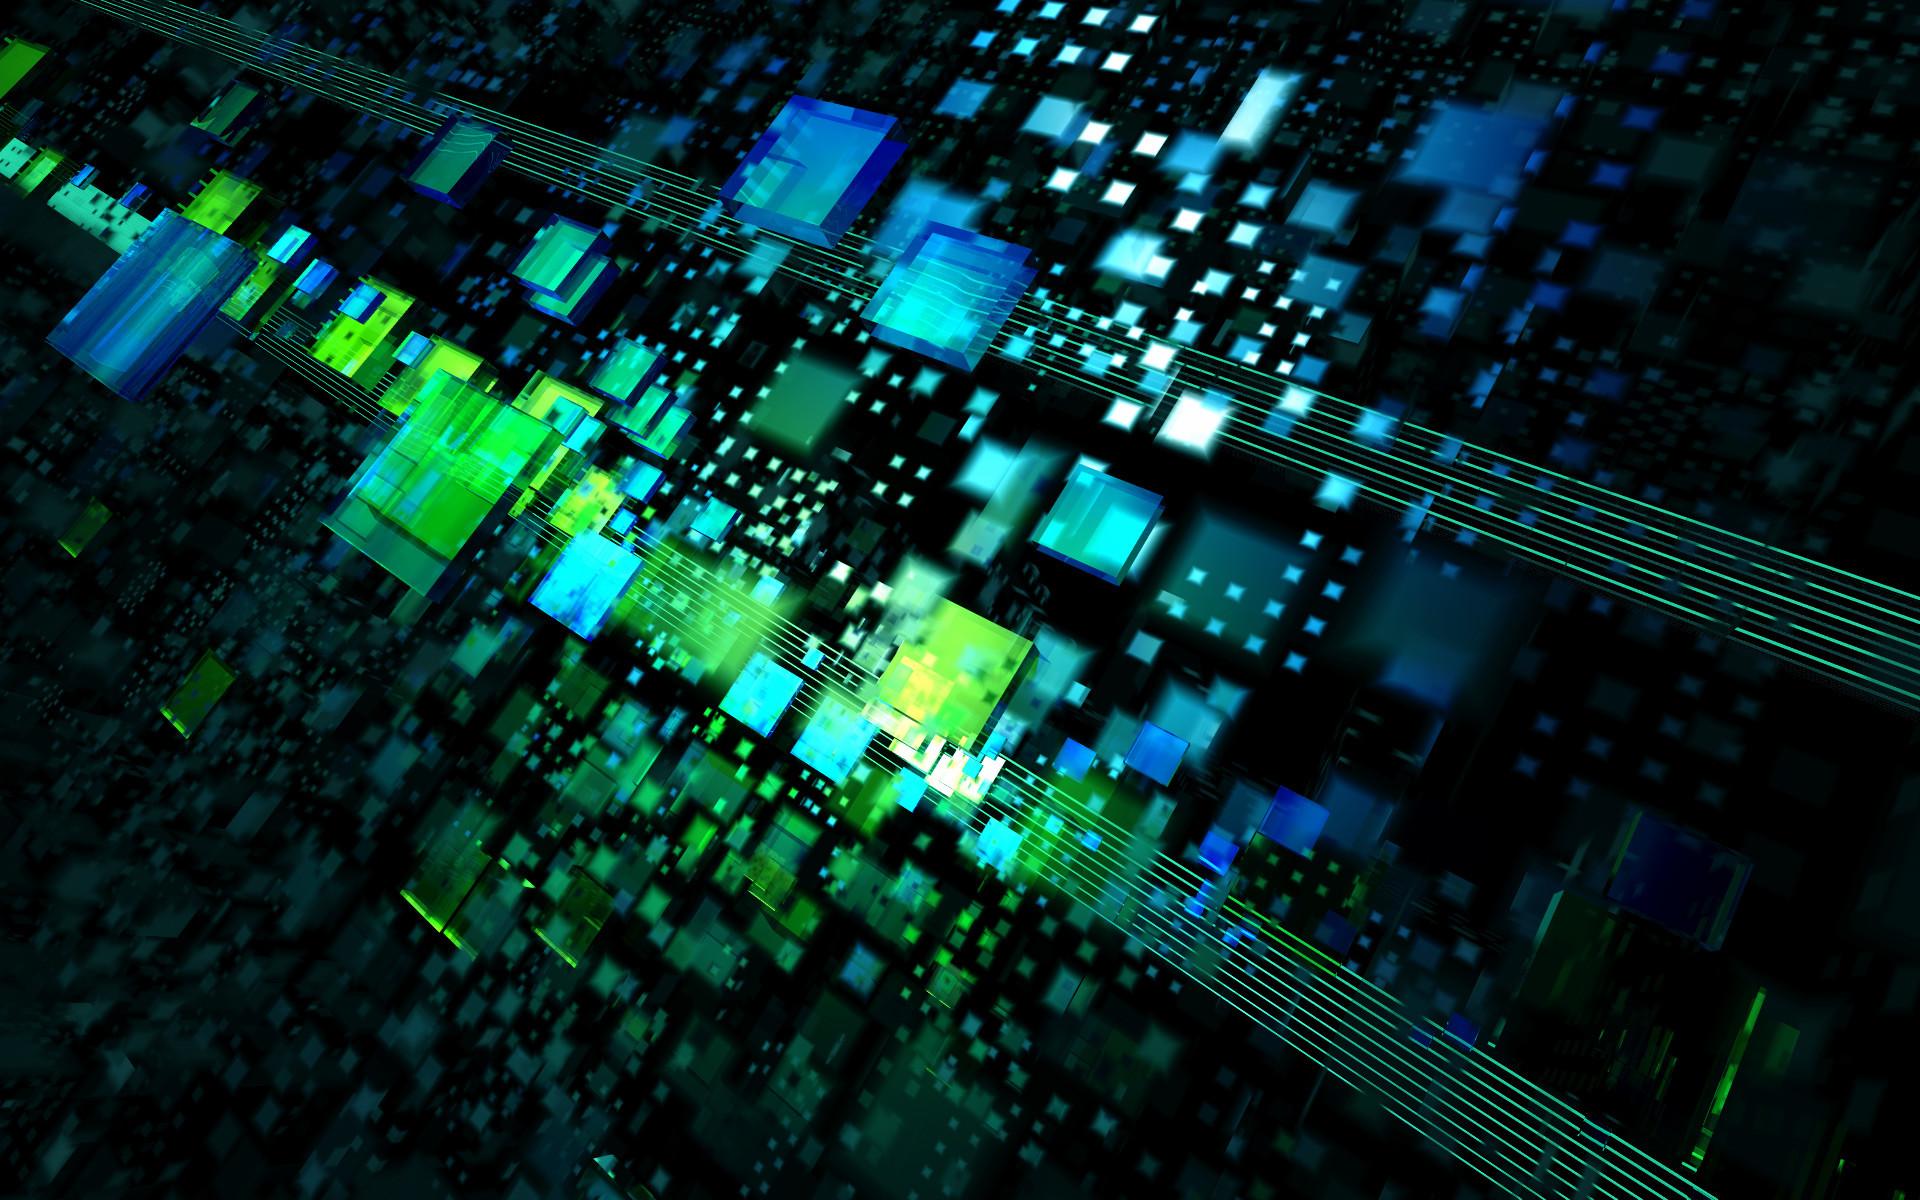 HD Wallpapers For Wide Screen Group Widescreen HD Desktop Wallpapers  Wallpapers)